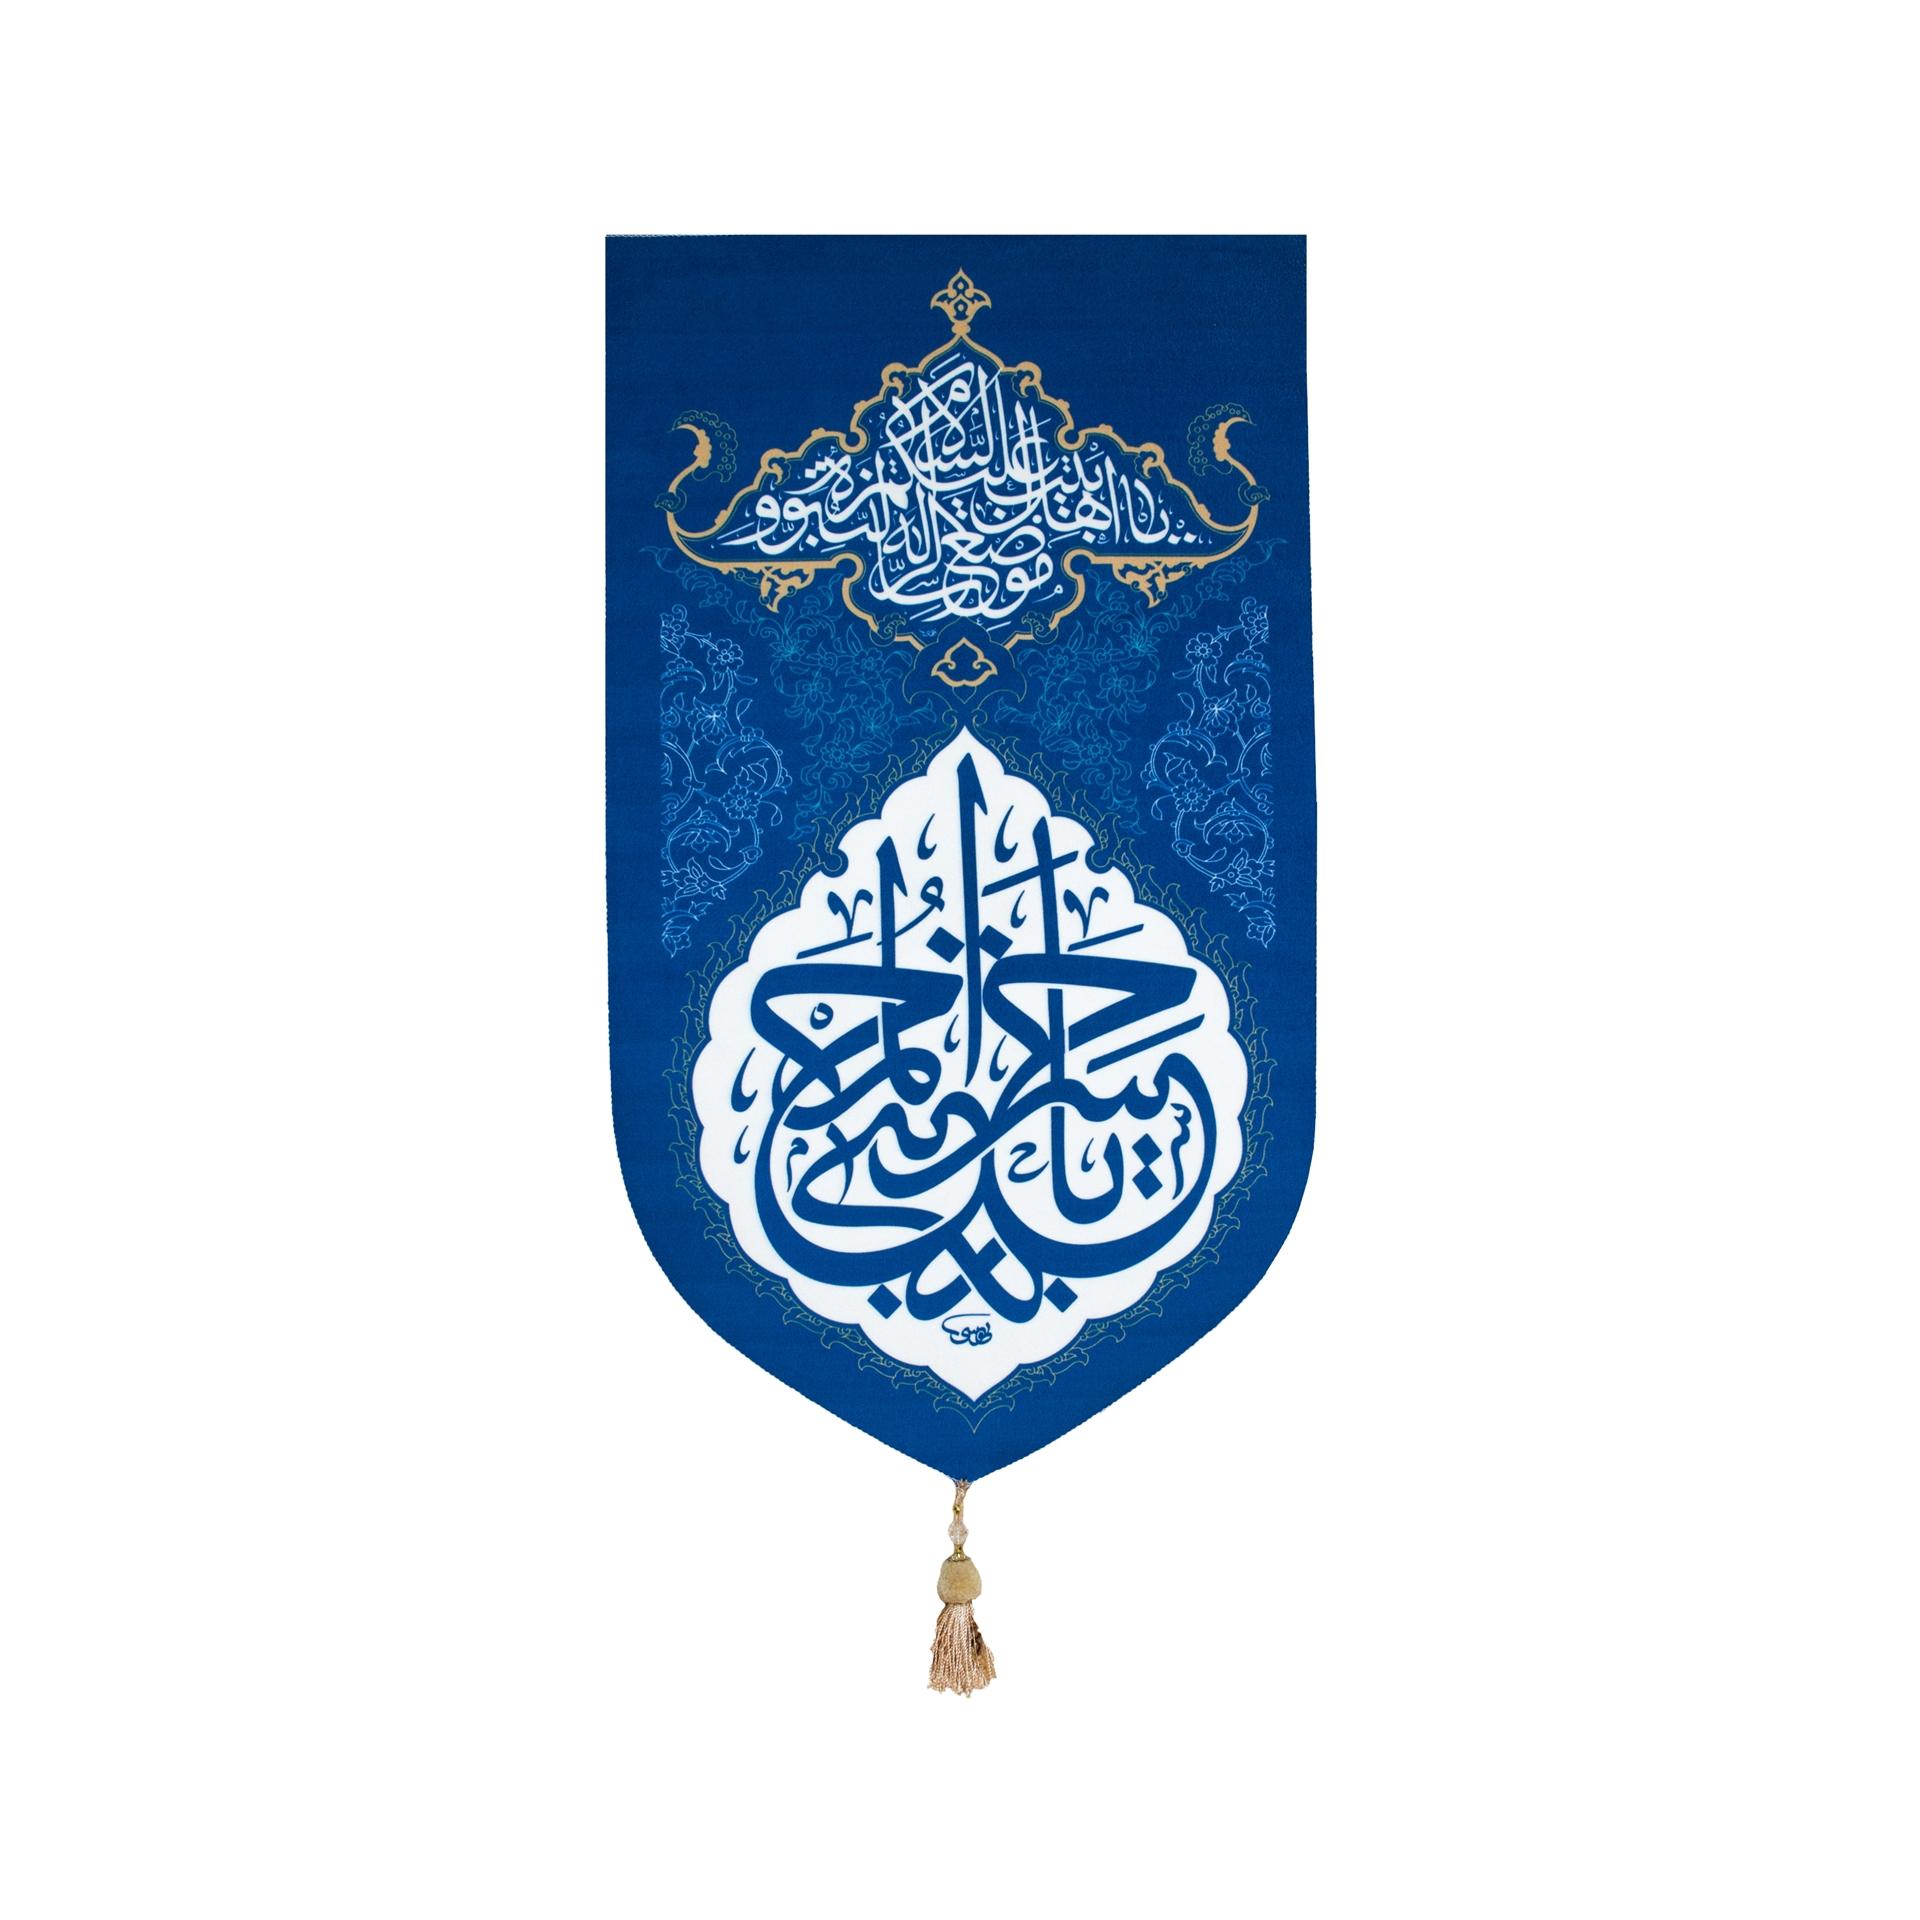 تصویر از بیرق خانگی طرح «یا حسن المجتبی» آبی  ۳۵×۵۰ سانتیمتر